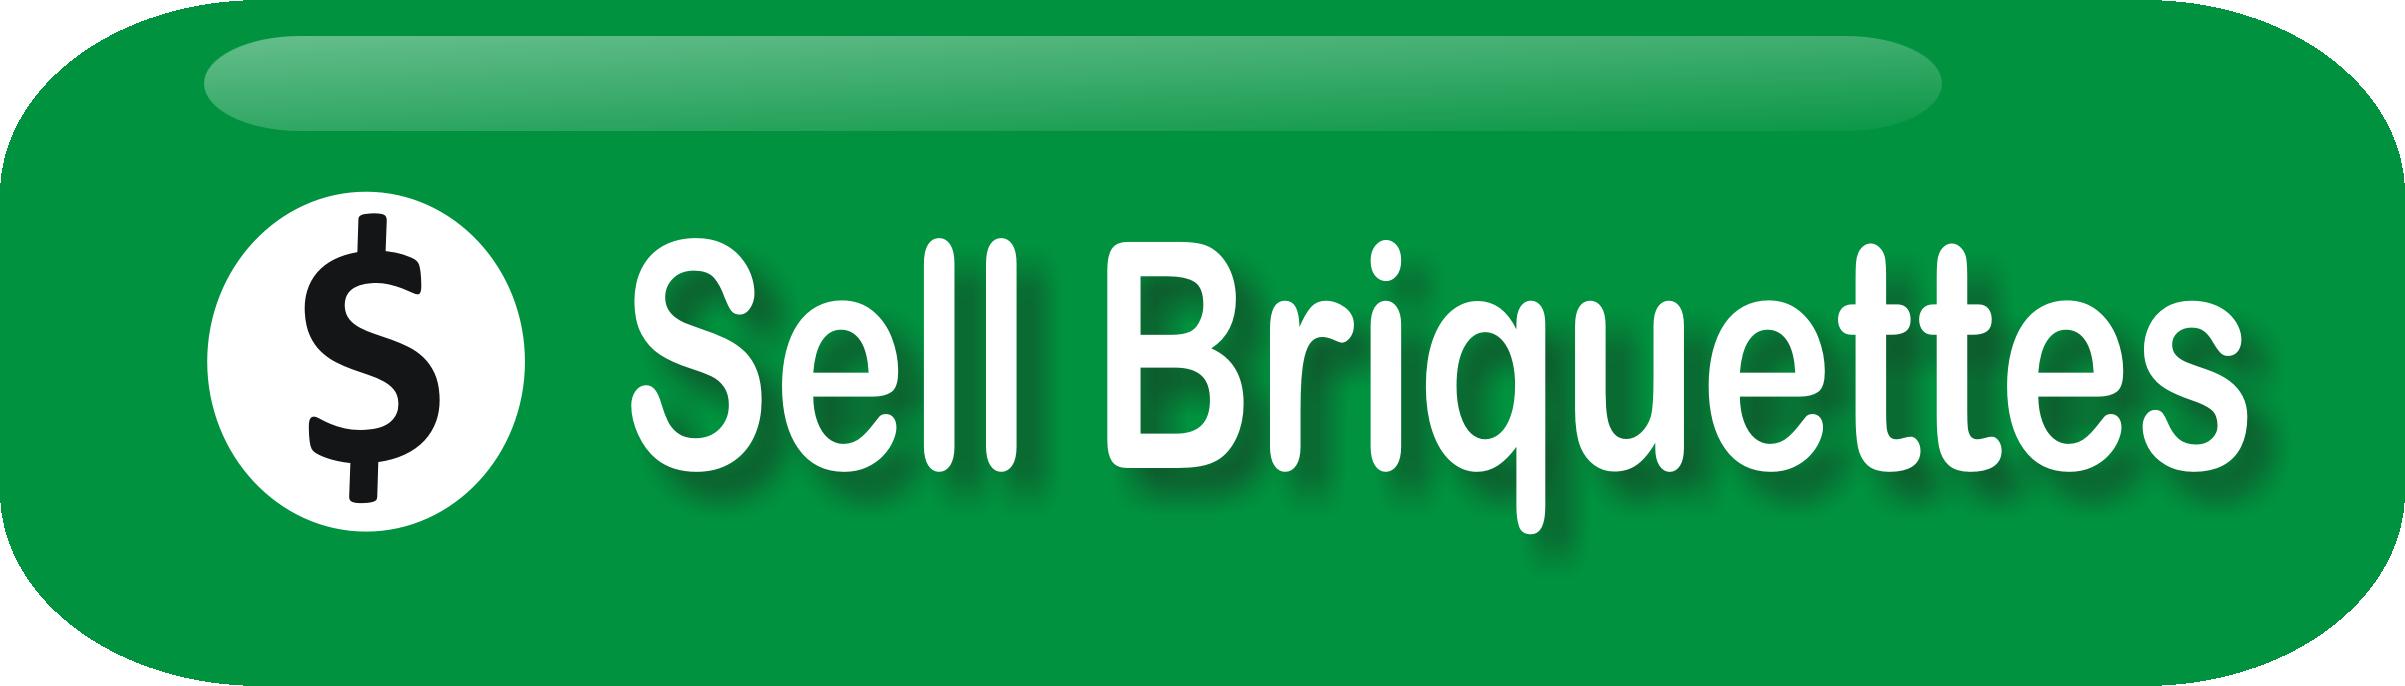 sell briquette